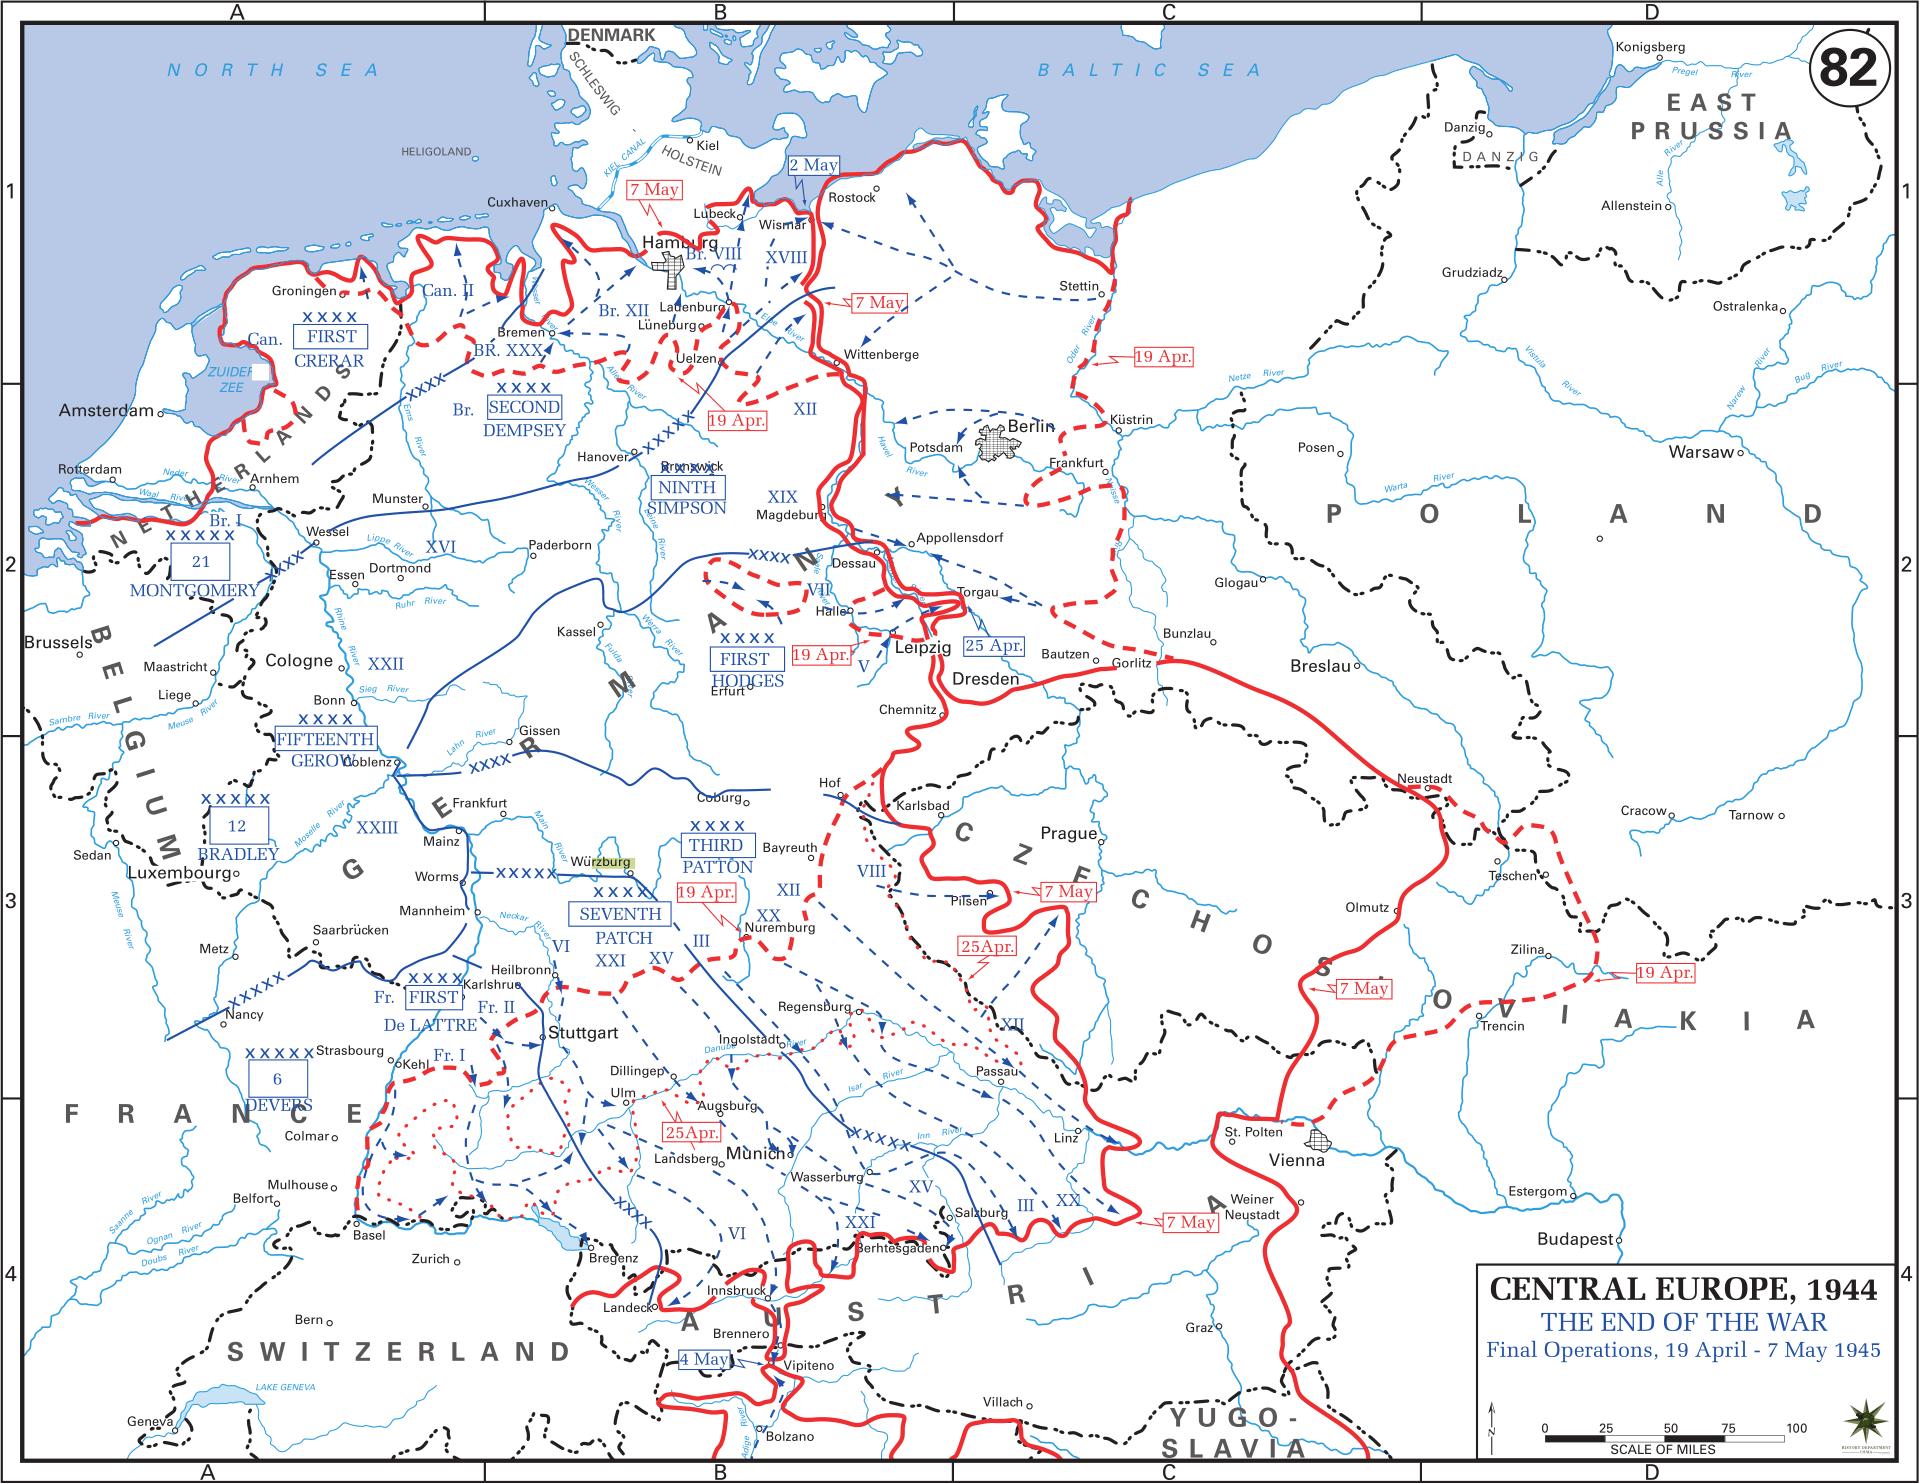 Western Front Maps Of World War Ii